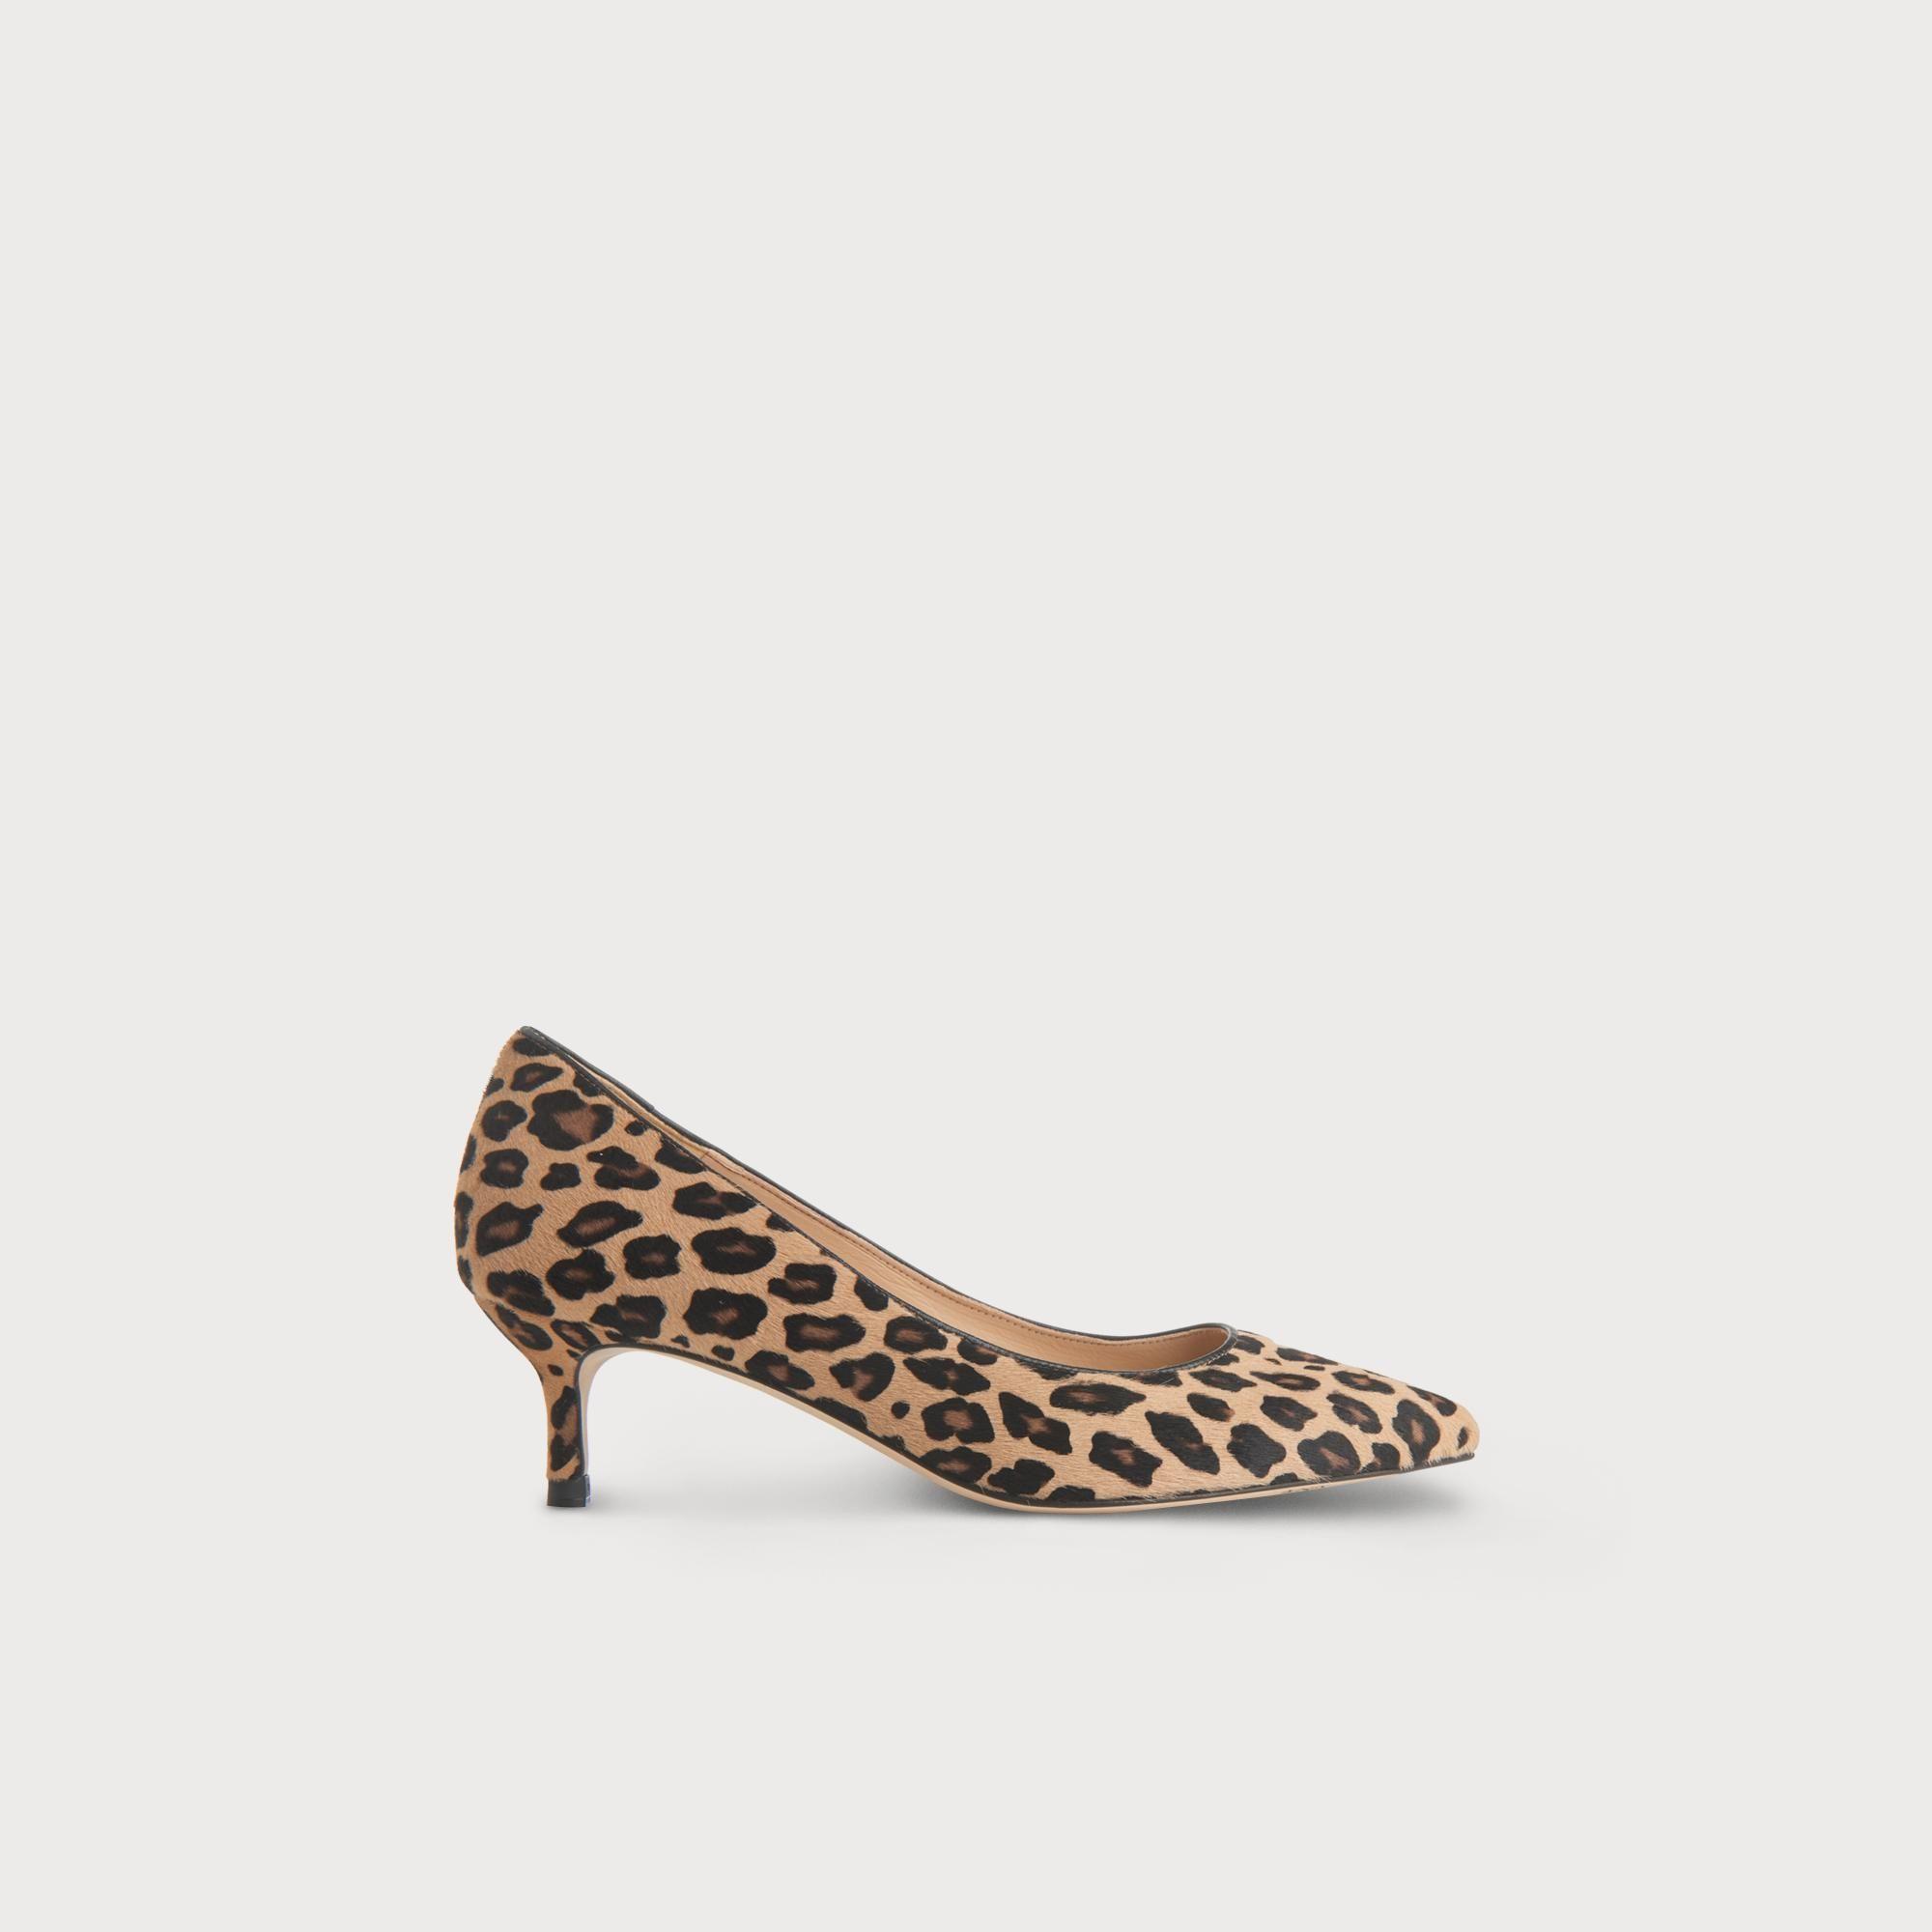 Audrey Leopard Print Heels Kitten Heels Shoes Collections L K Bennett London Kitten Heels Heels Kitten Heel Shoes